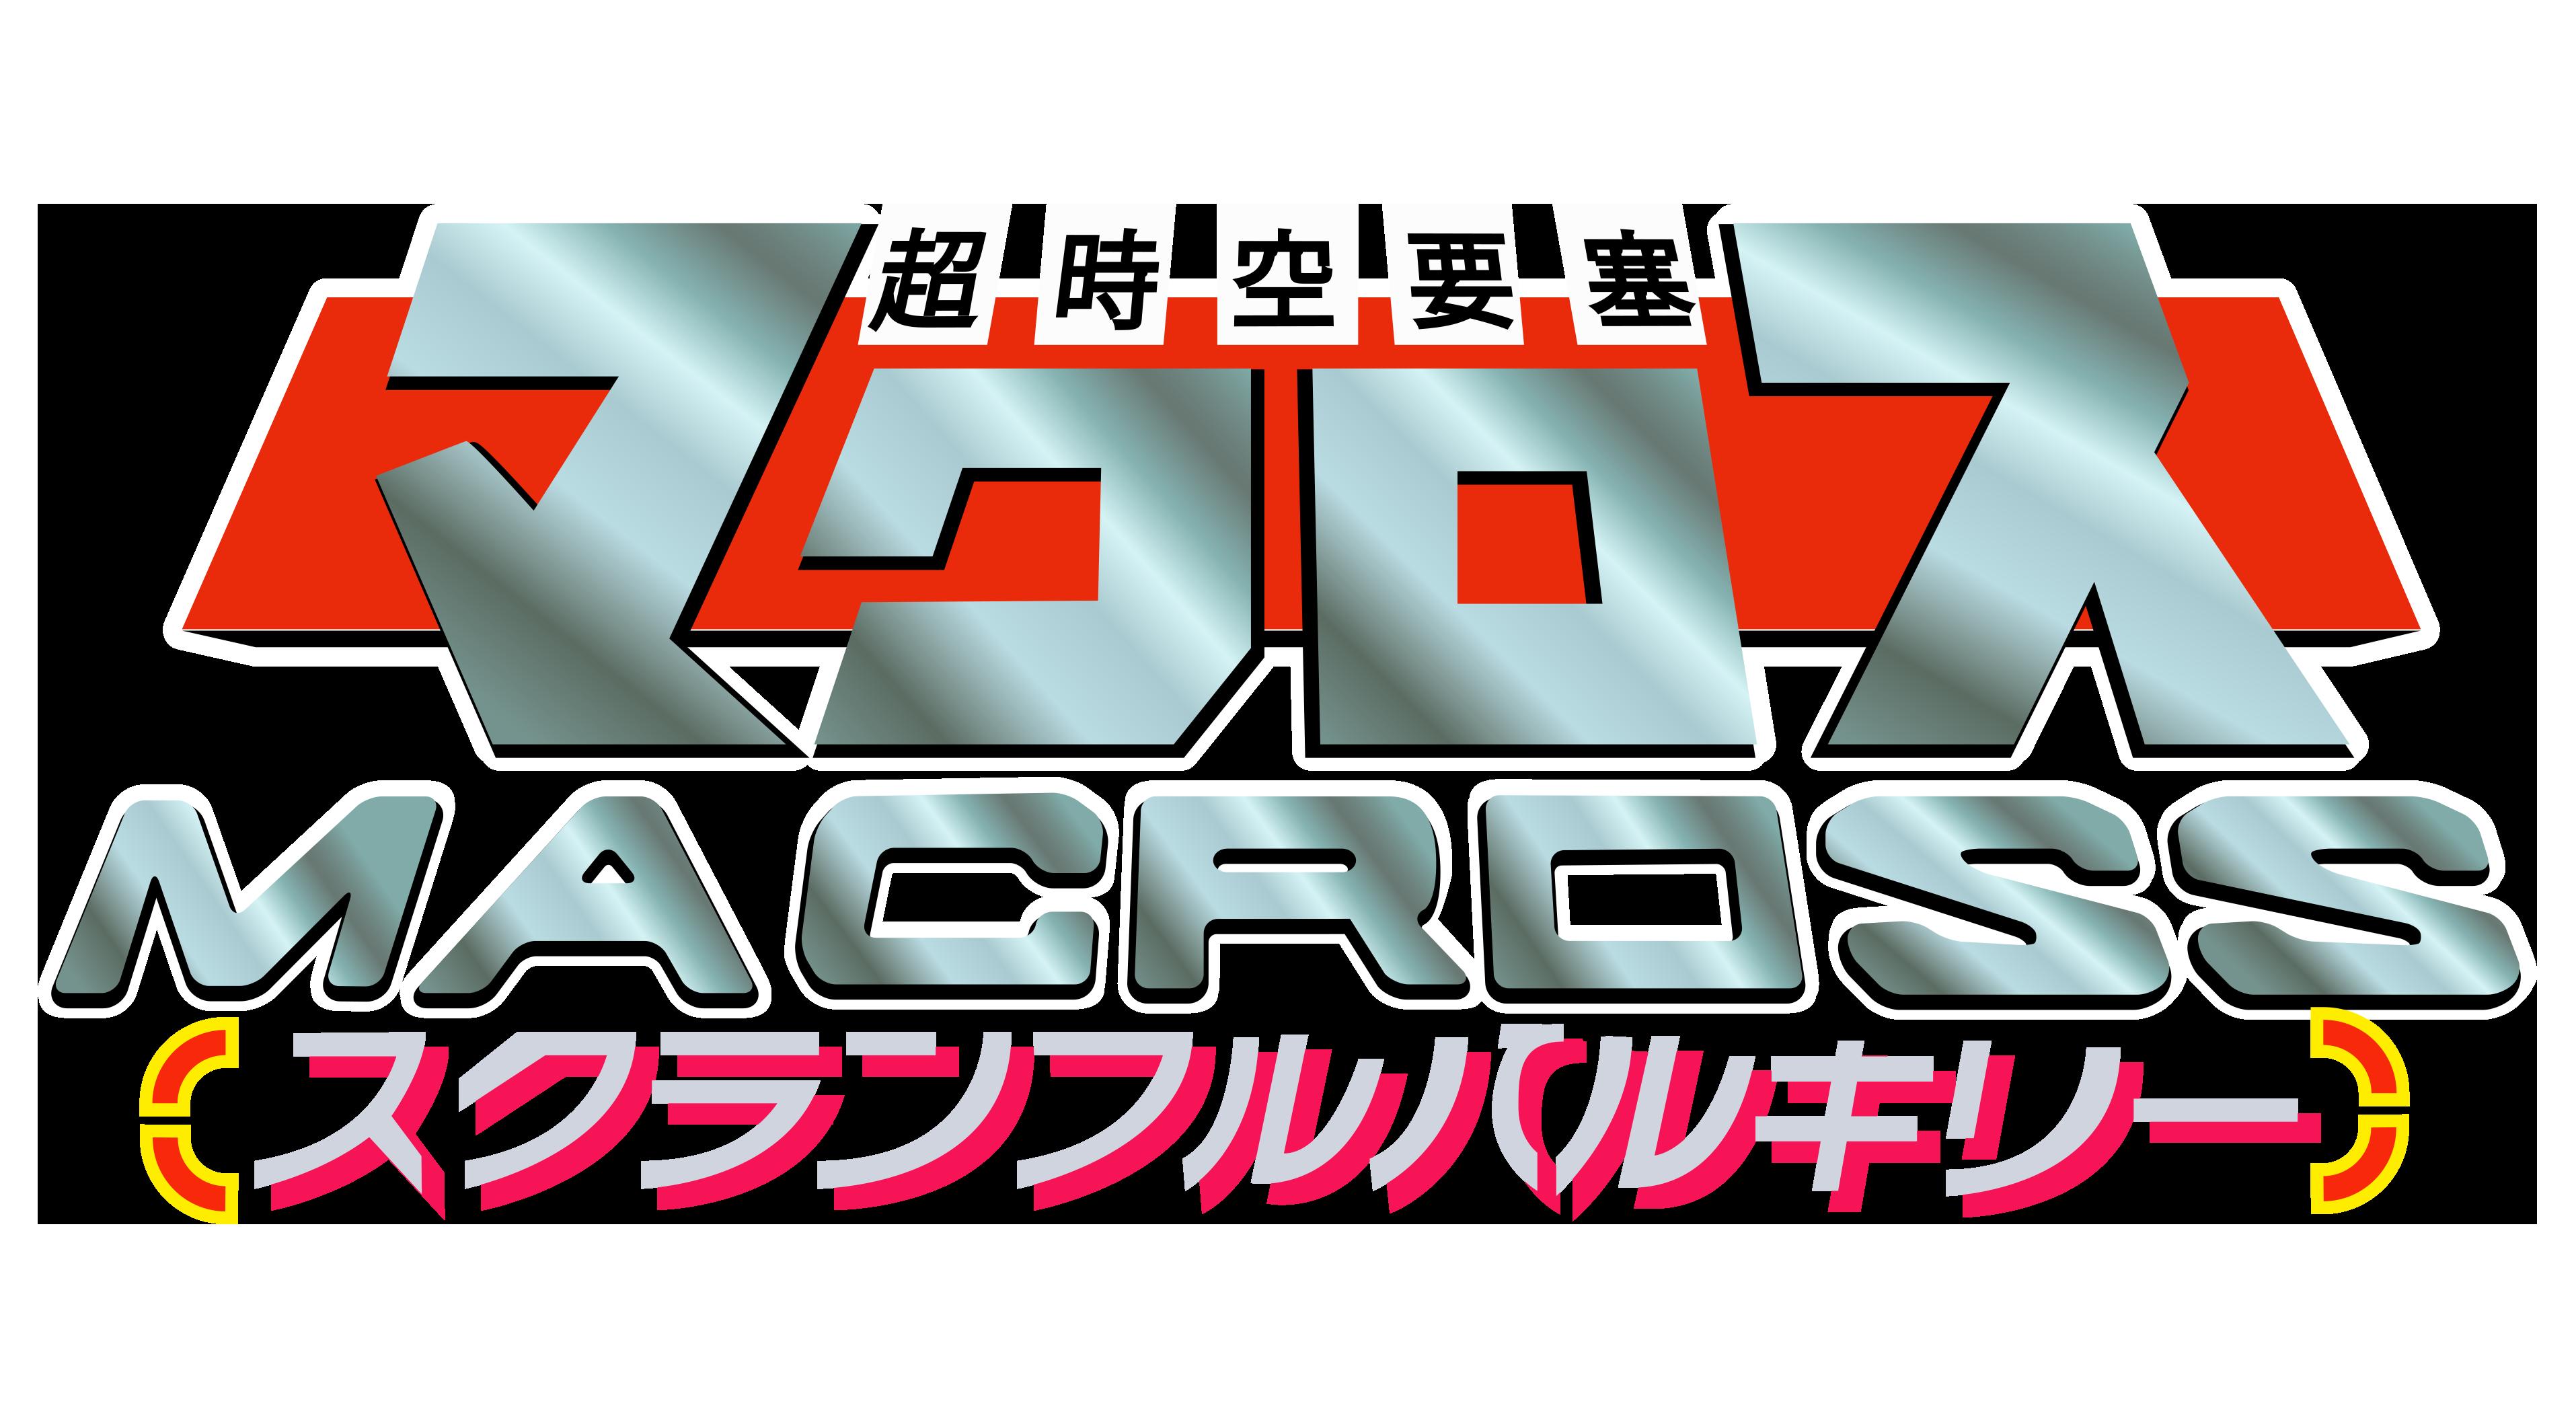 Choujikuu Yousai Macross Scrambled Valkyrie Details